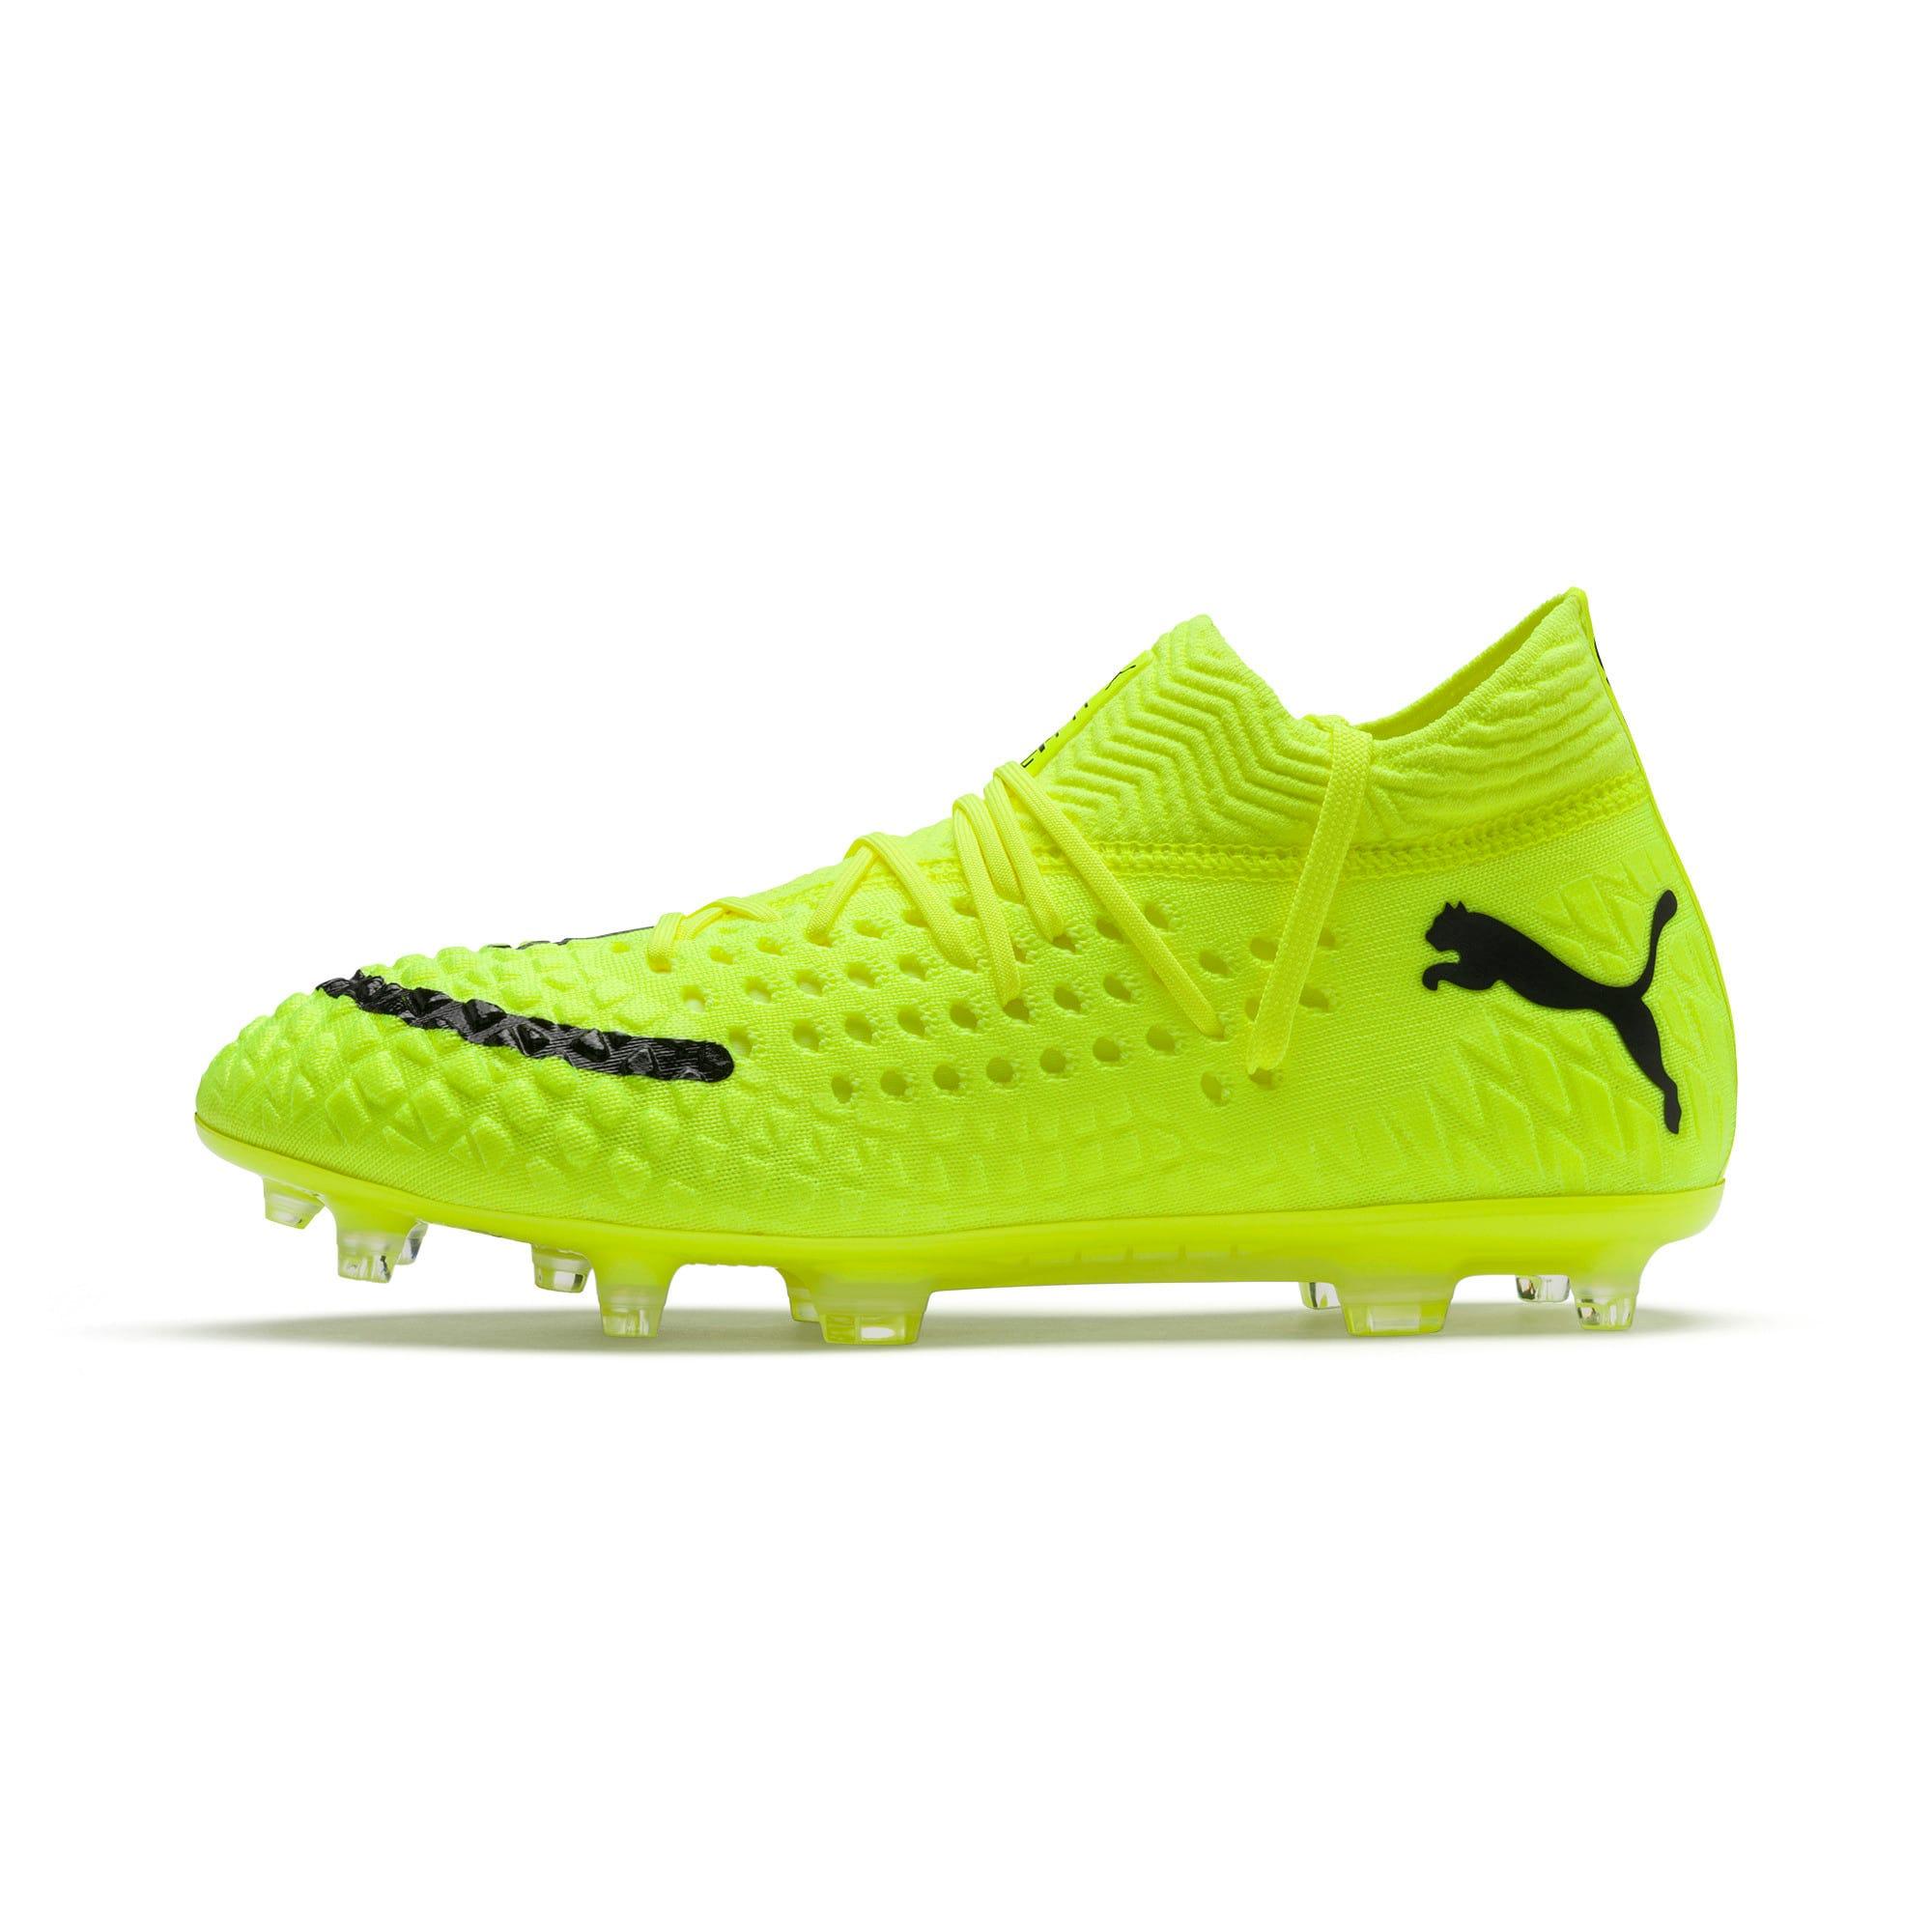 Thumbnail 1 of FUTURE 4.1 NETFIT Griezmann FG/AG Men's Football Boots, Yellow Alert-Puma Black, medium